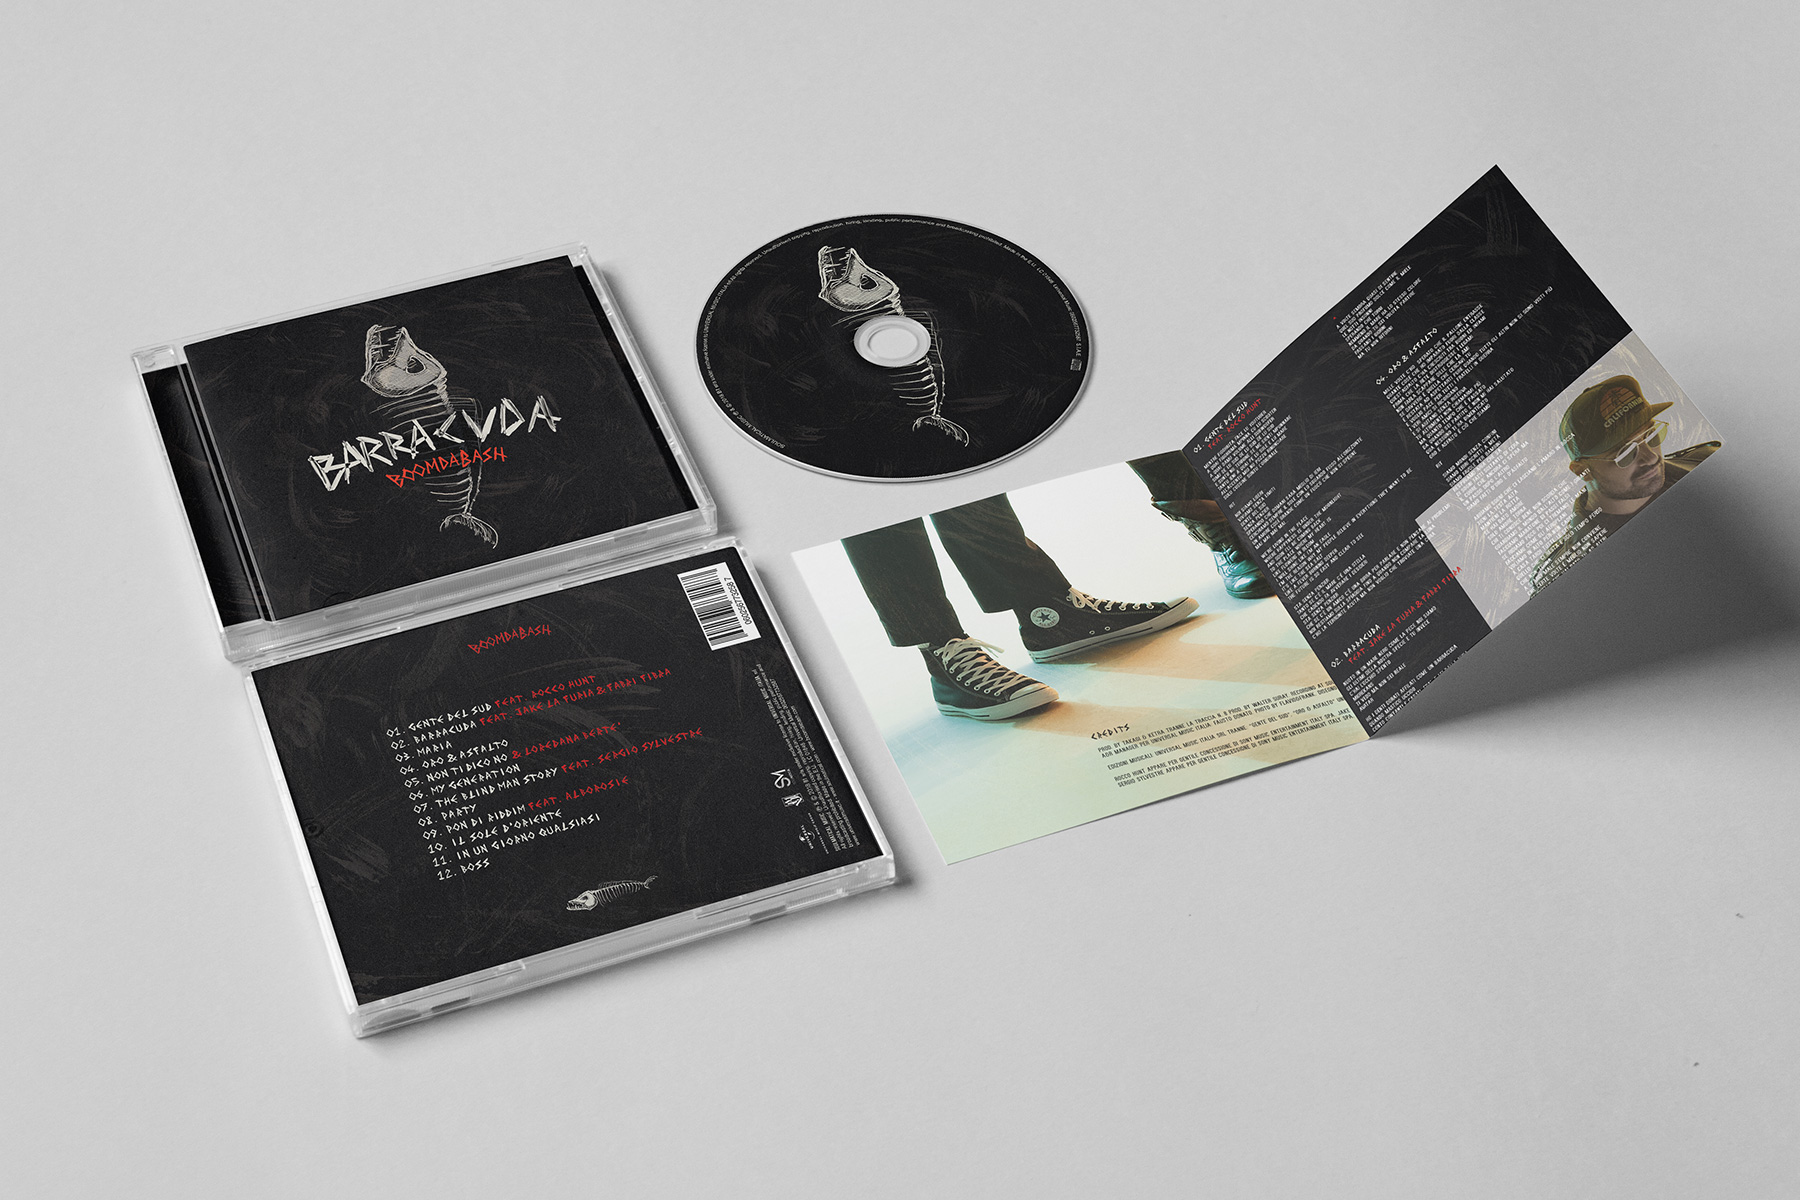 "Boomdabash ""Barracuda"" – CD Pack, Tour Poster - img 6"